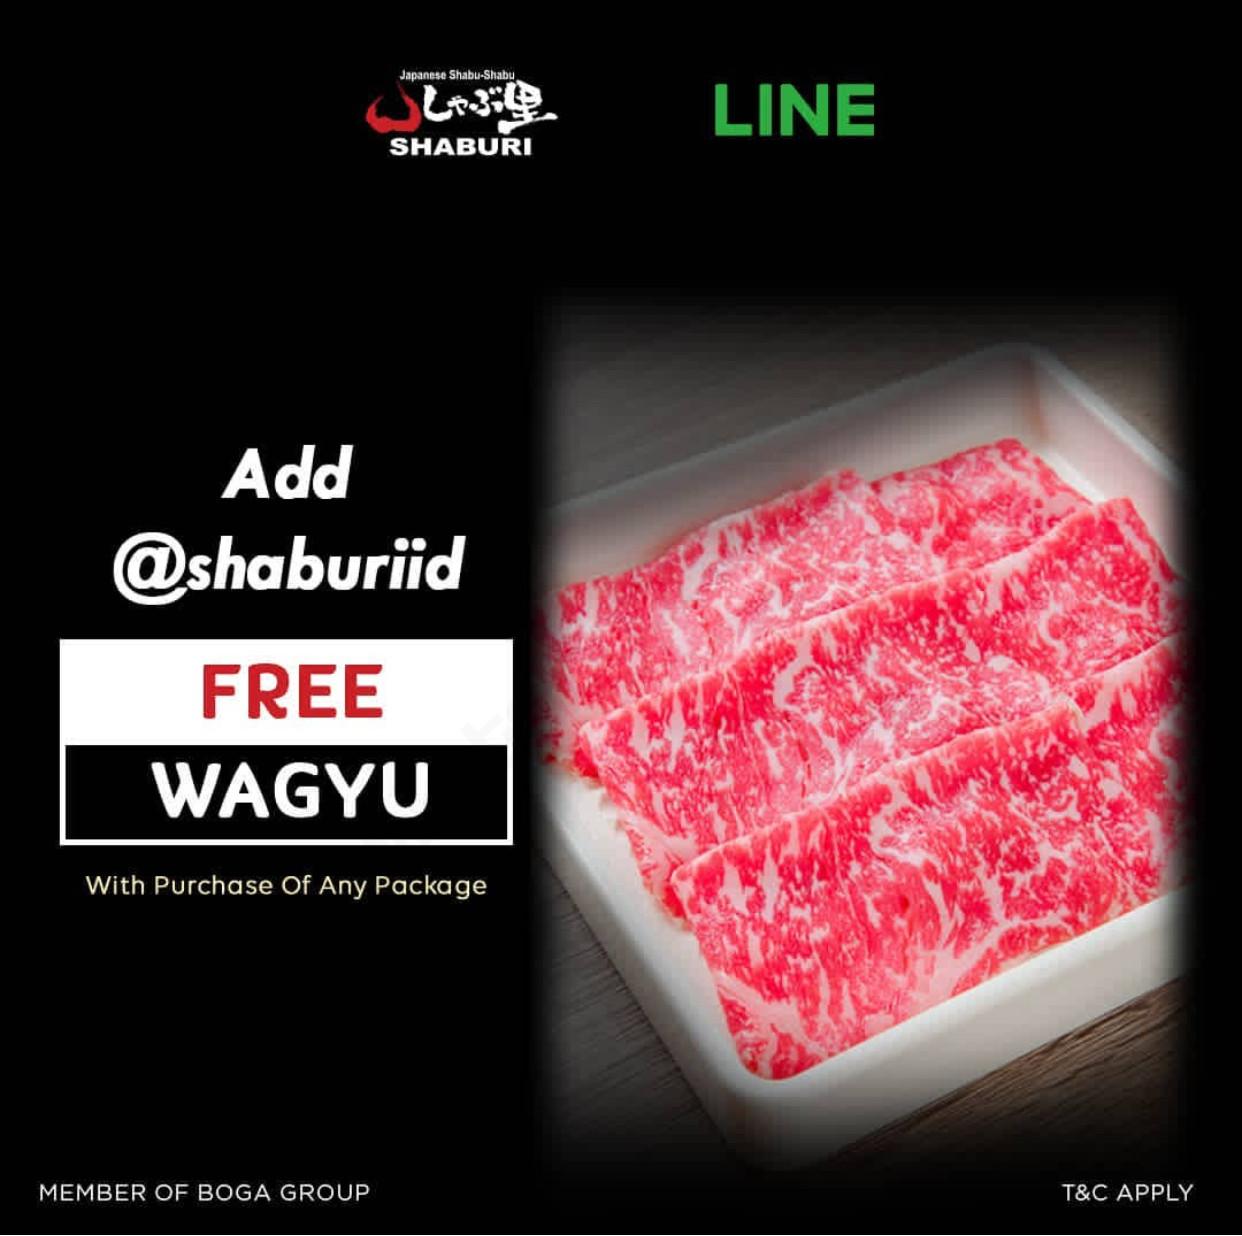 SHABURI Special Promotion Dapatkan GRATIS Wagyu dengan Kupon LINE